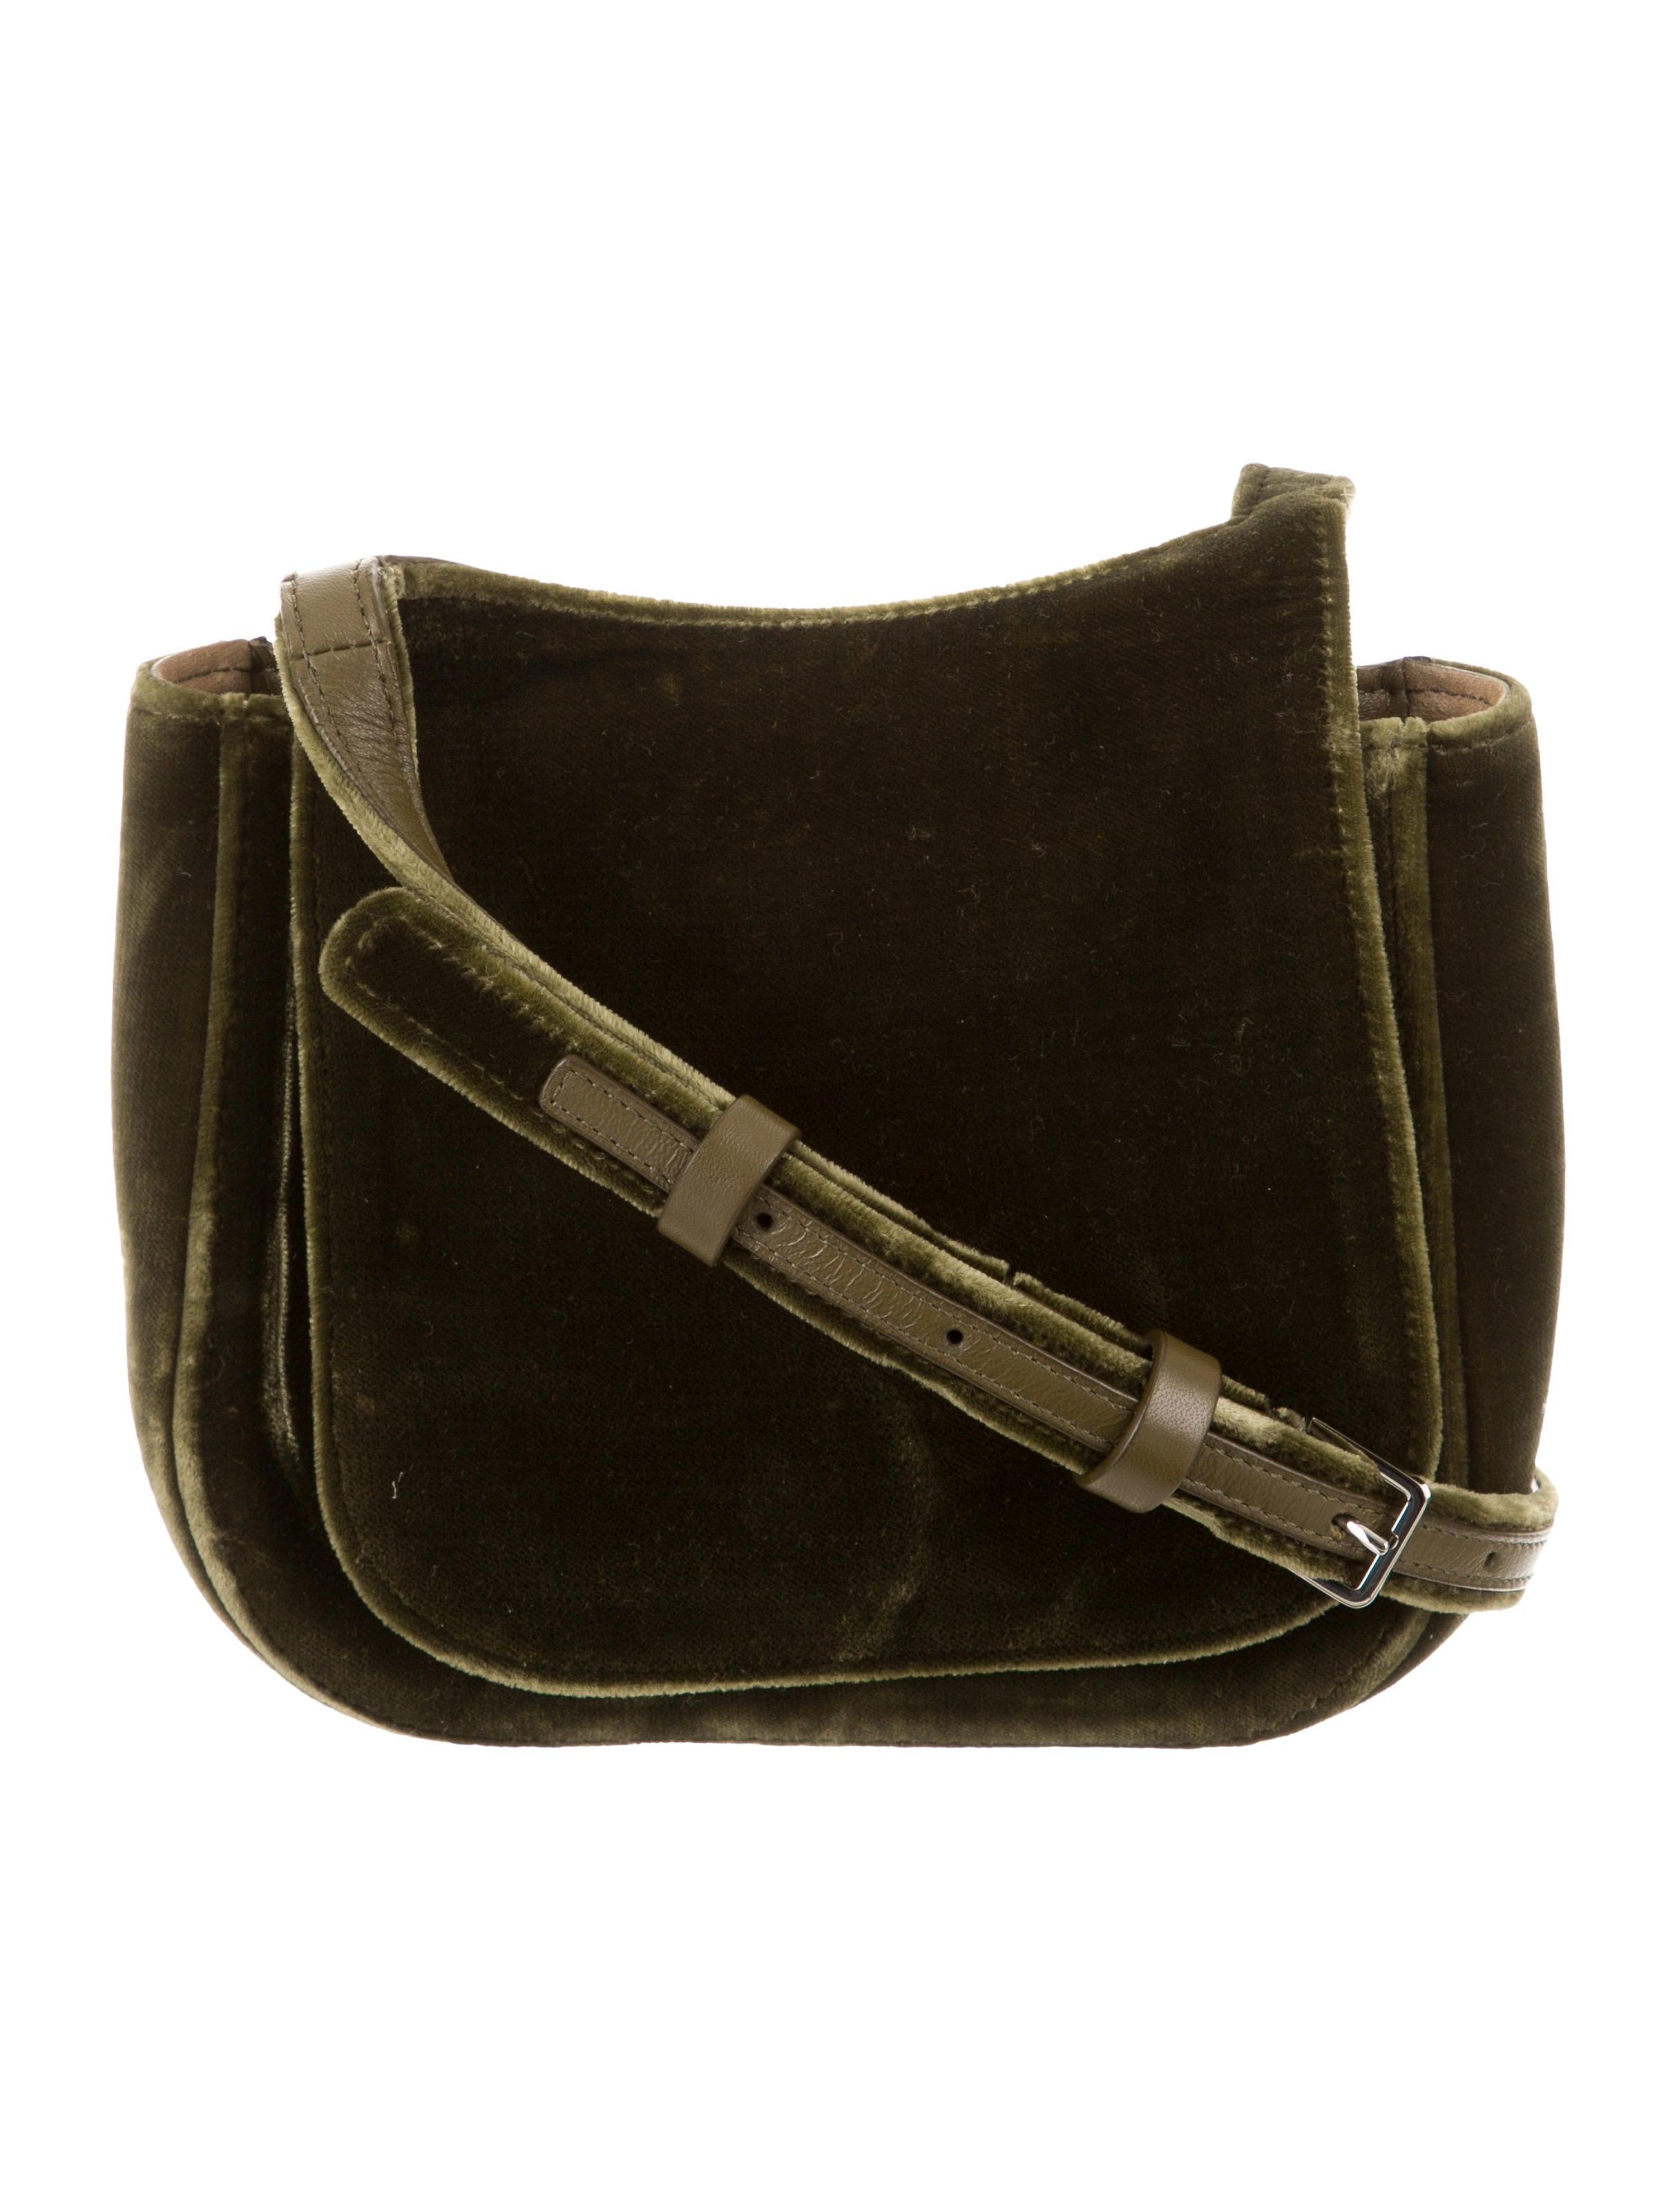 2b12a9f1305 Handbags | The RealReal